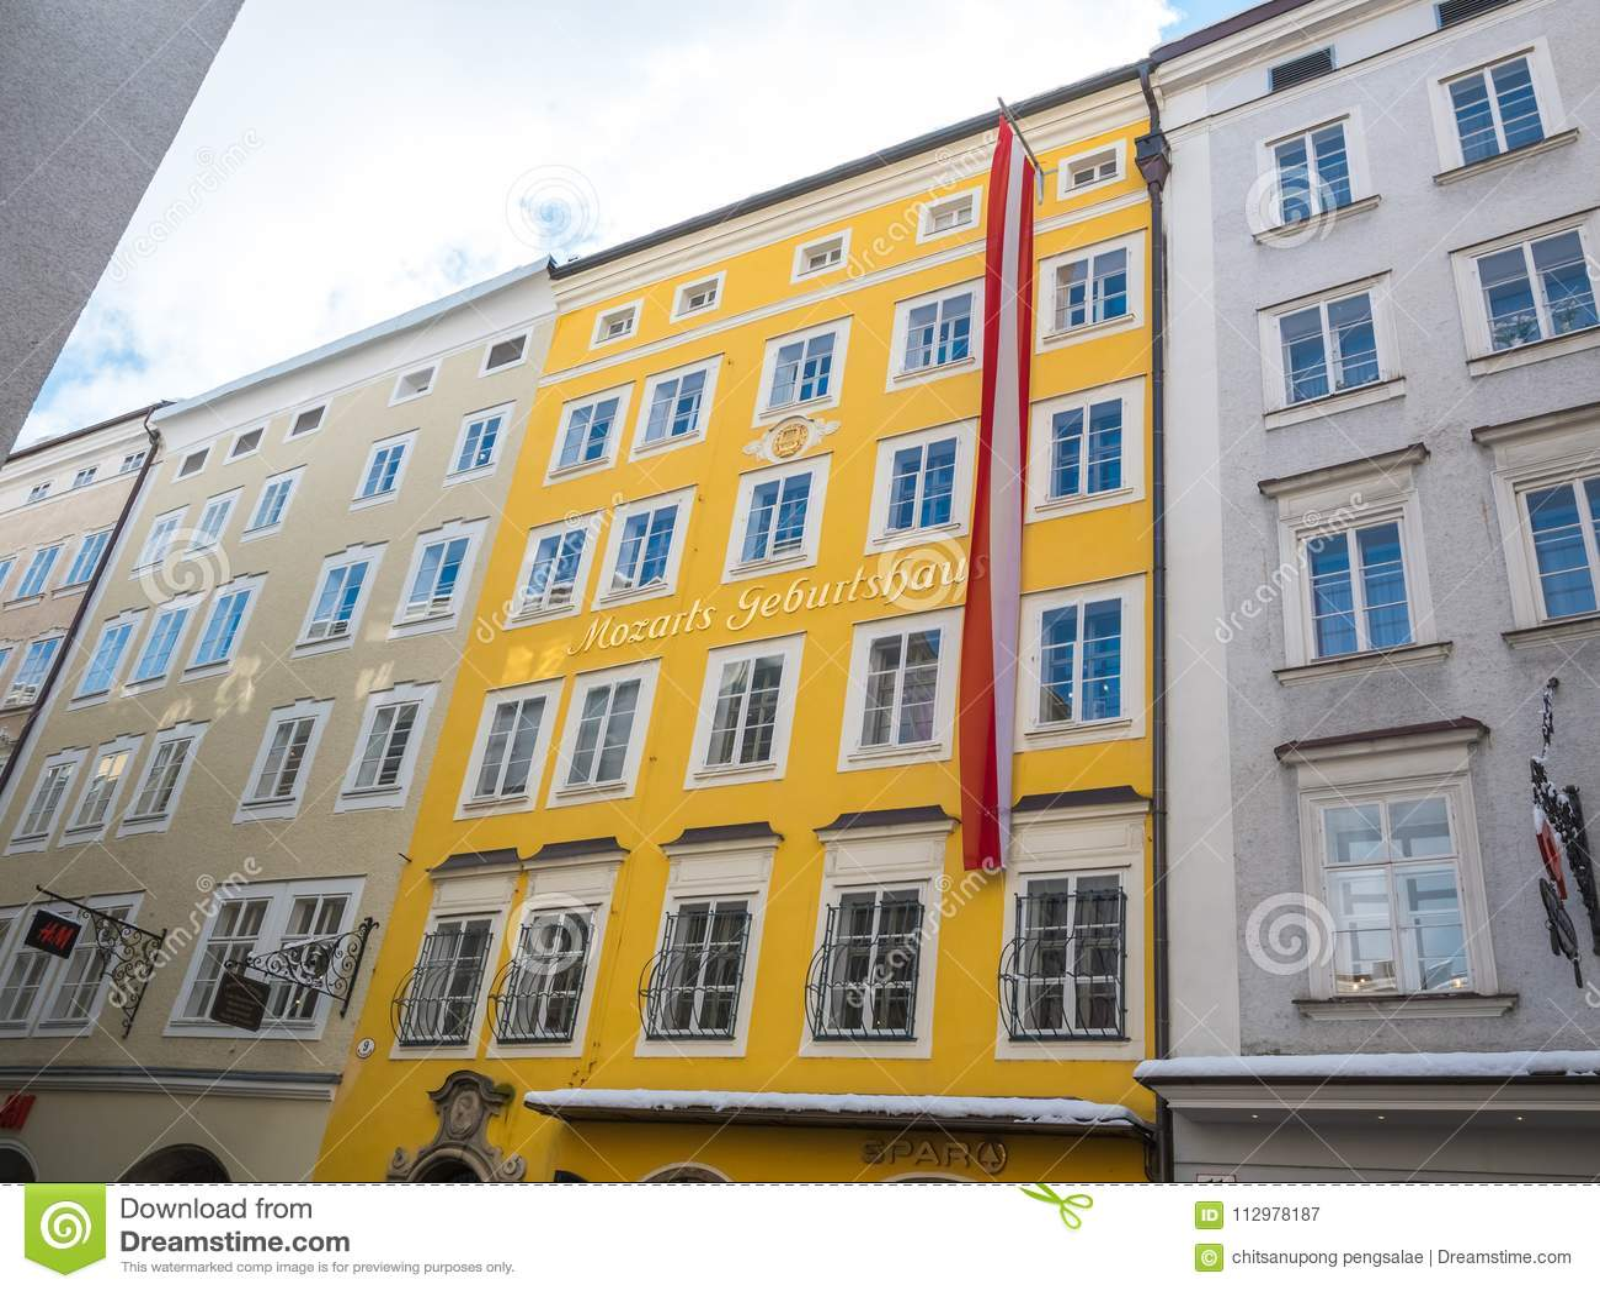 Mozart birthplace in salzburg austria flag winter season snow